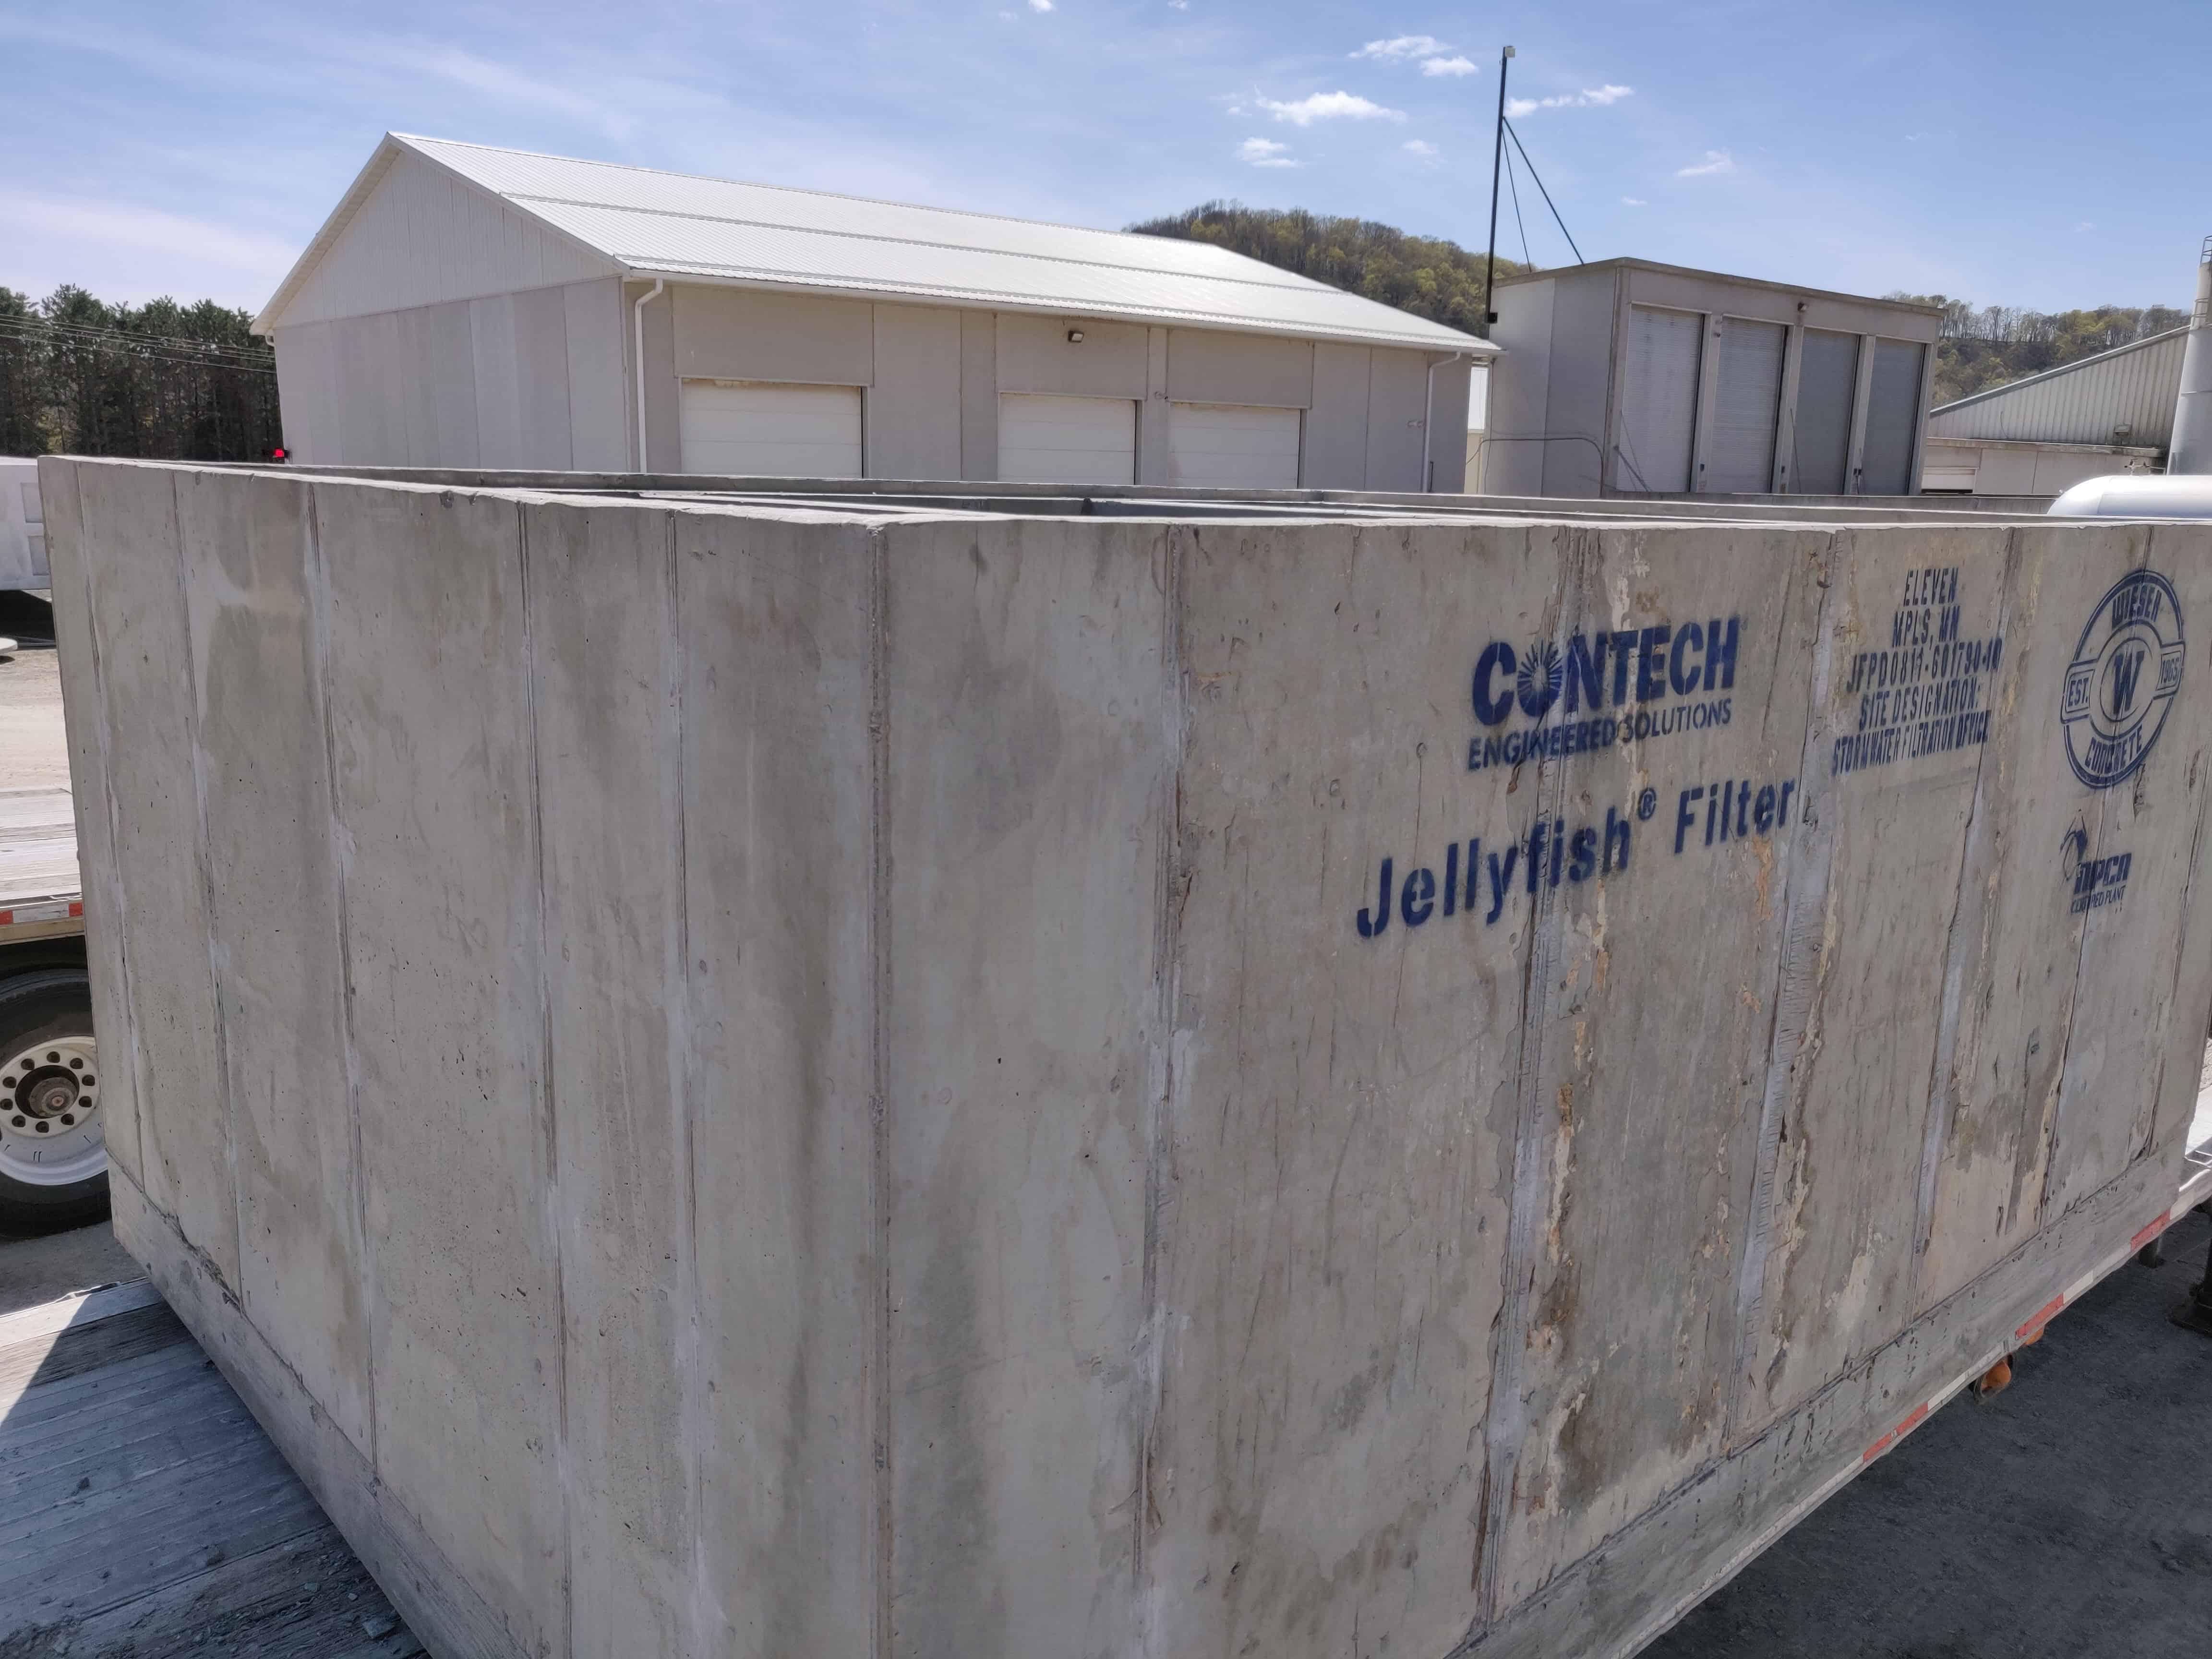 Contech Jellyfish Filter Eleven Condo Tower - Wieser Concrete